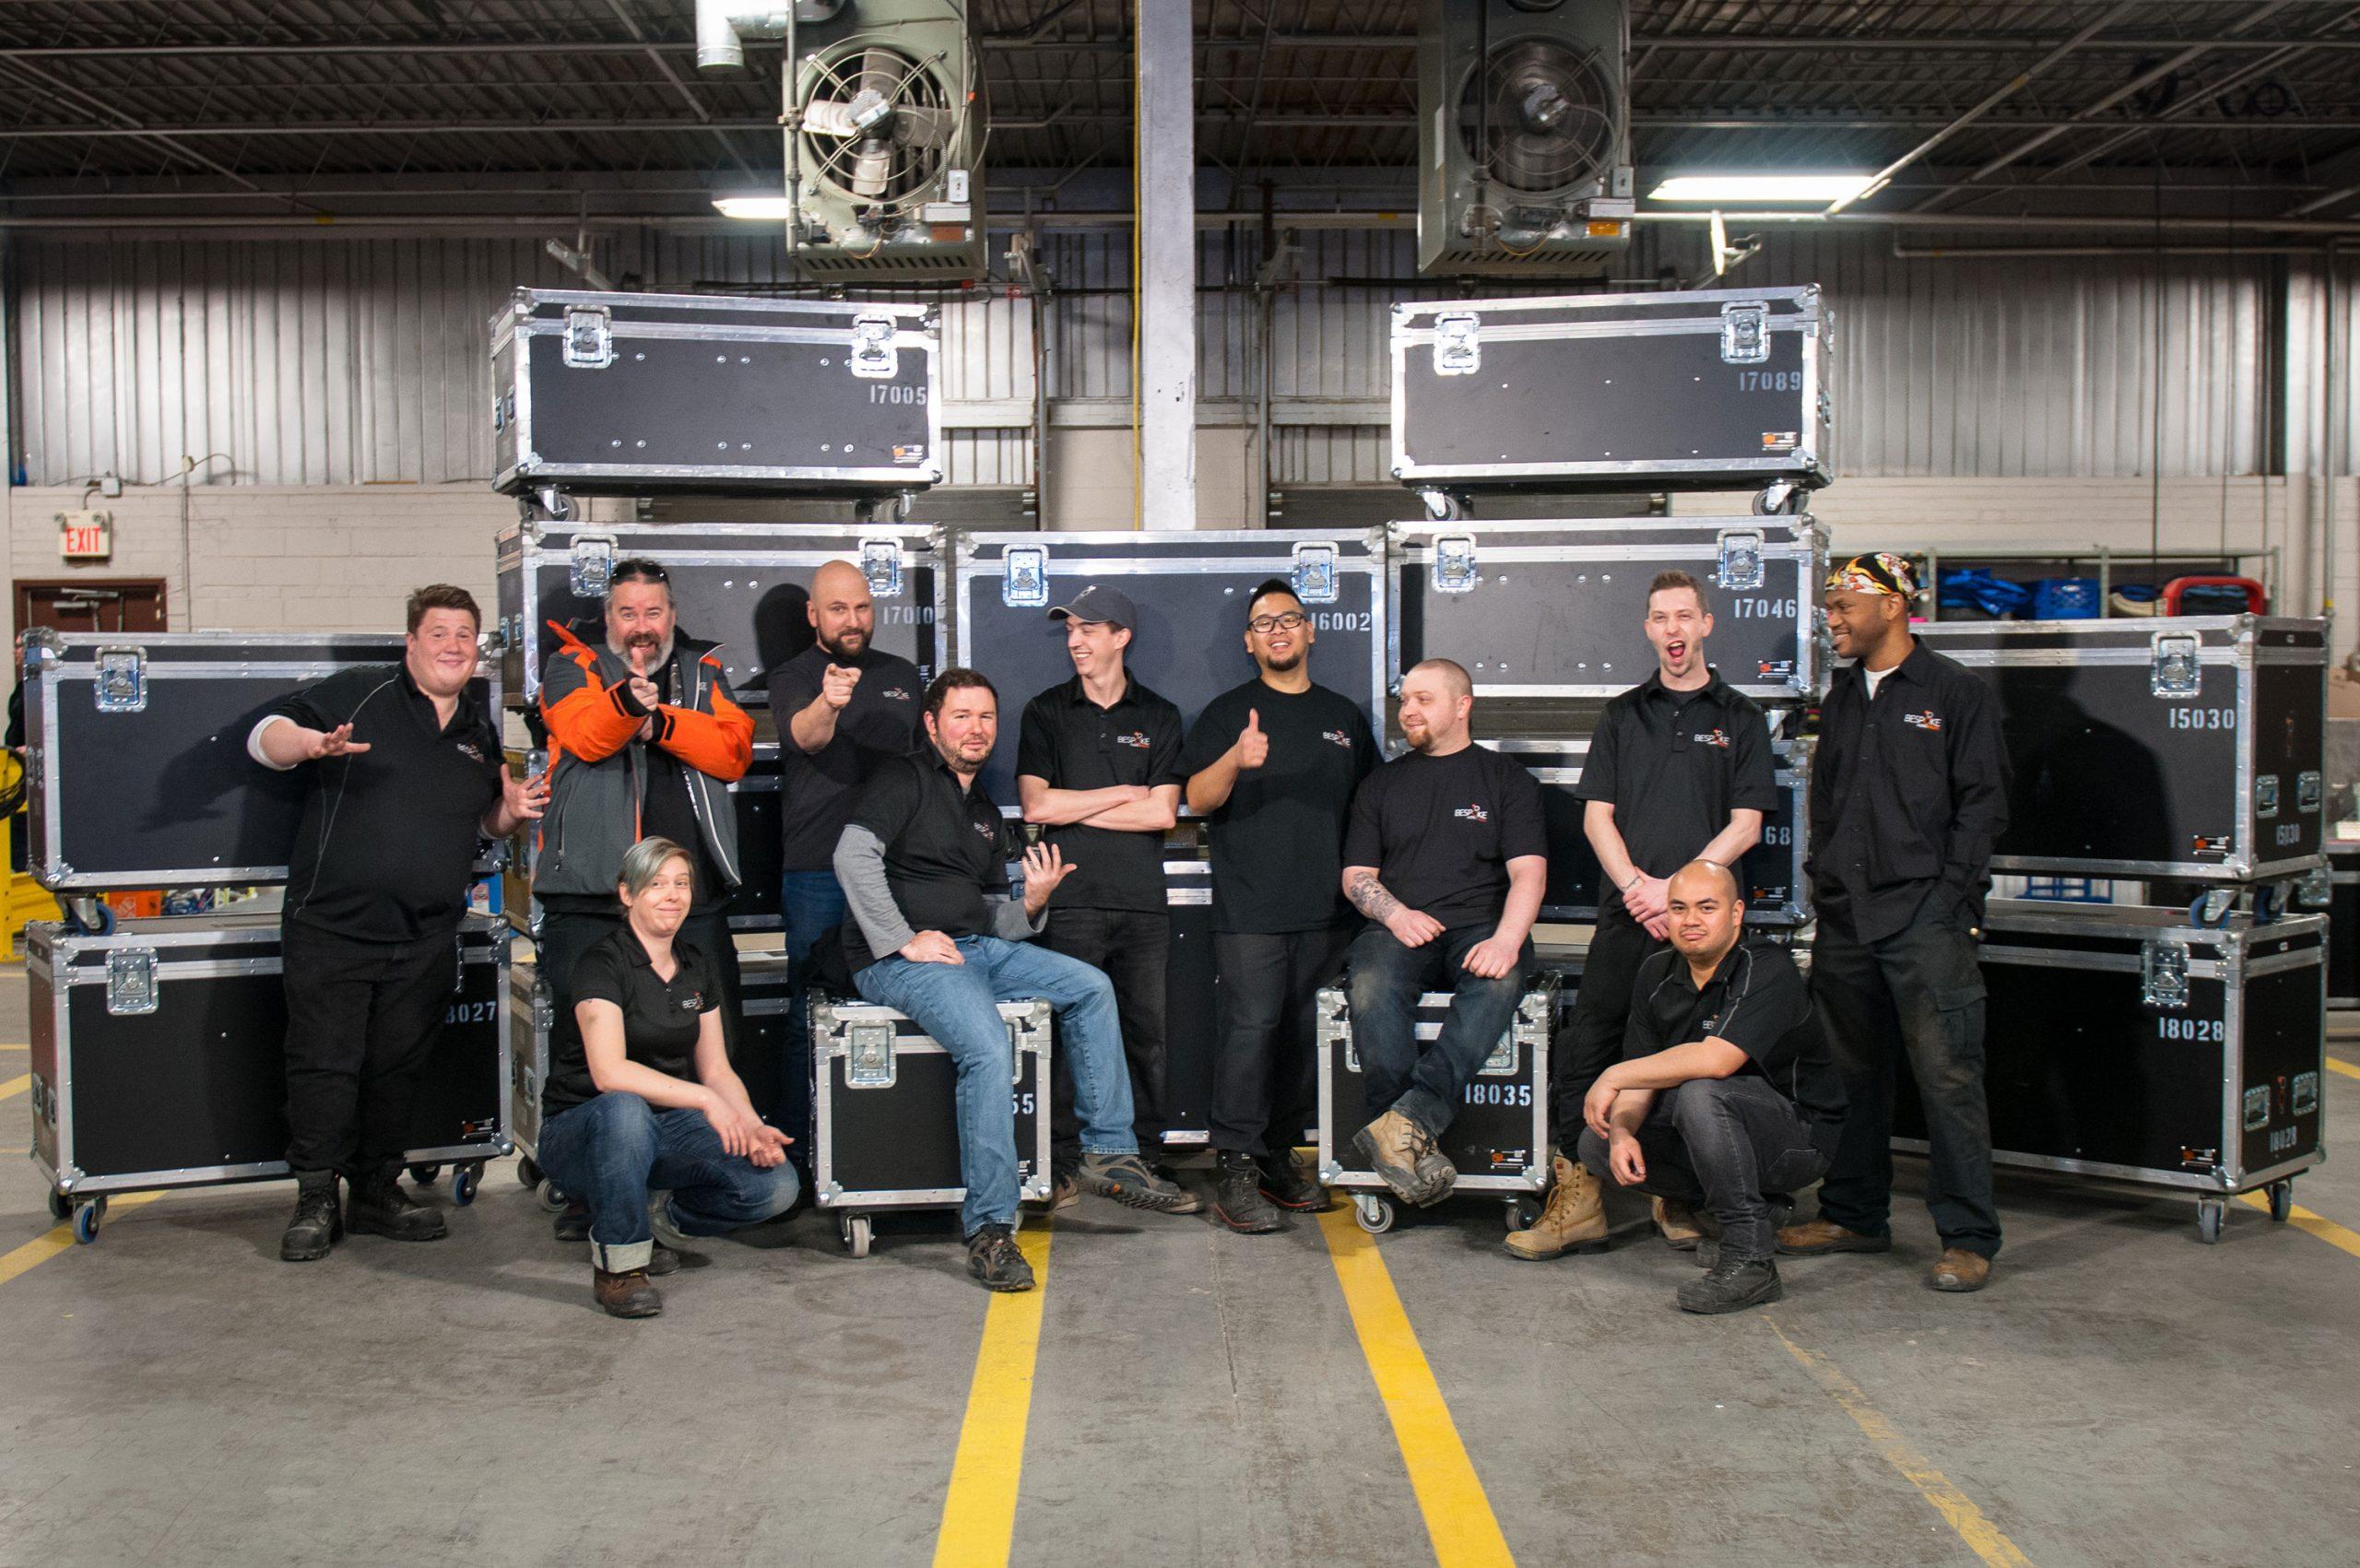 Bespoke Audio Visual warehouse team